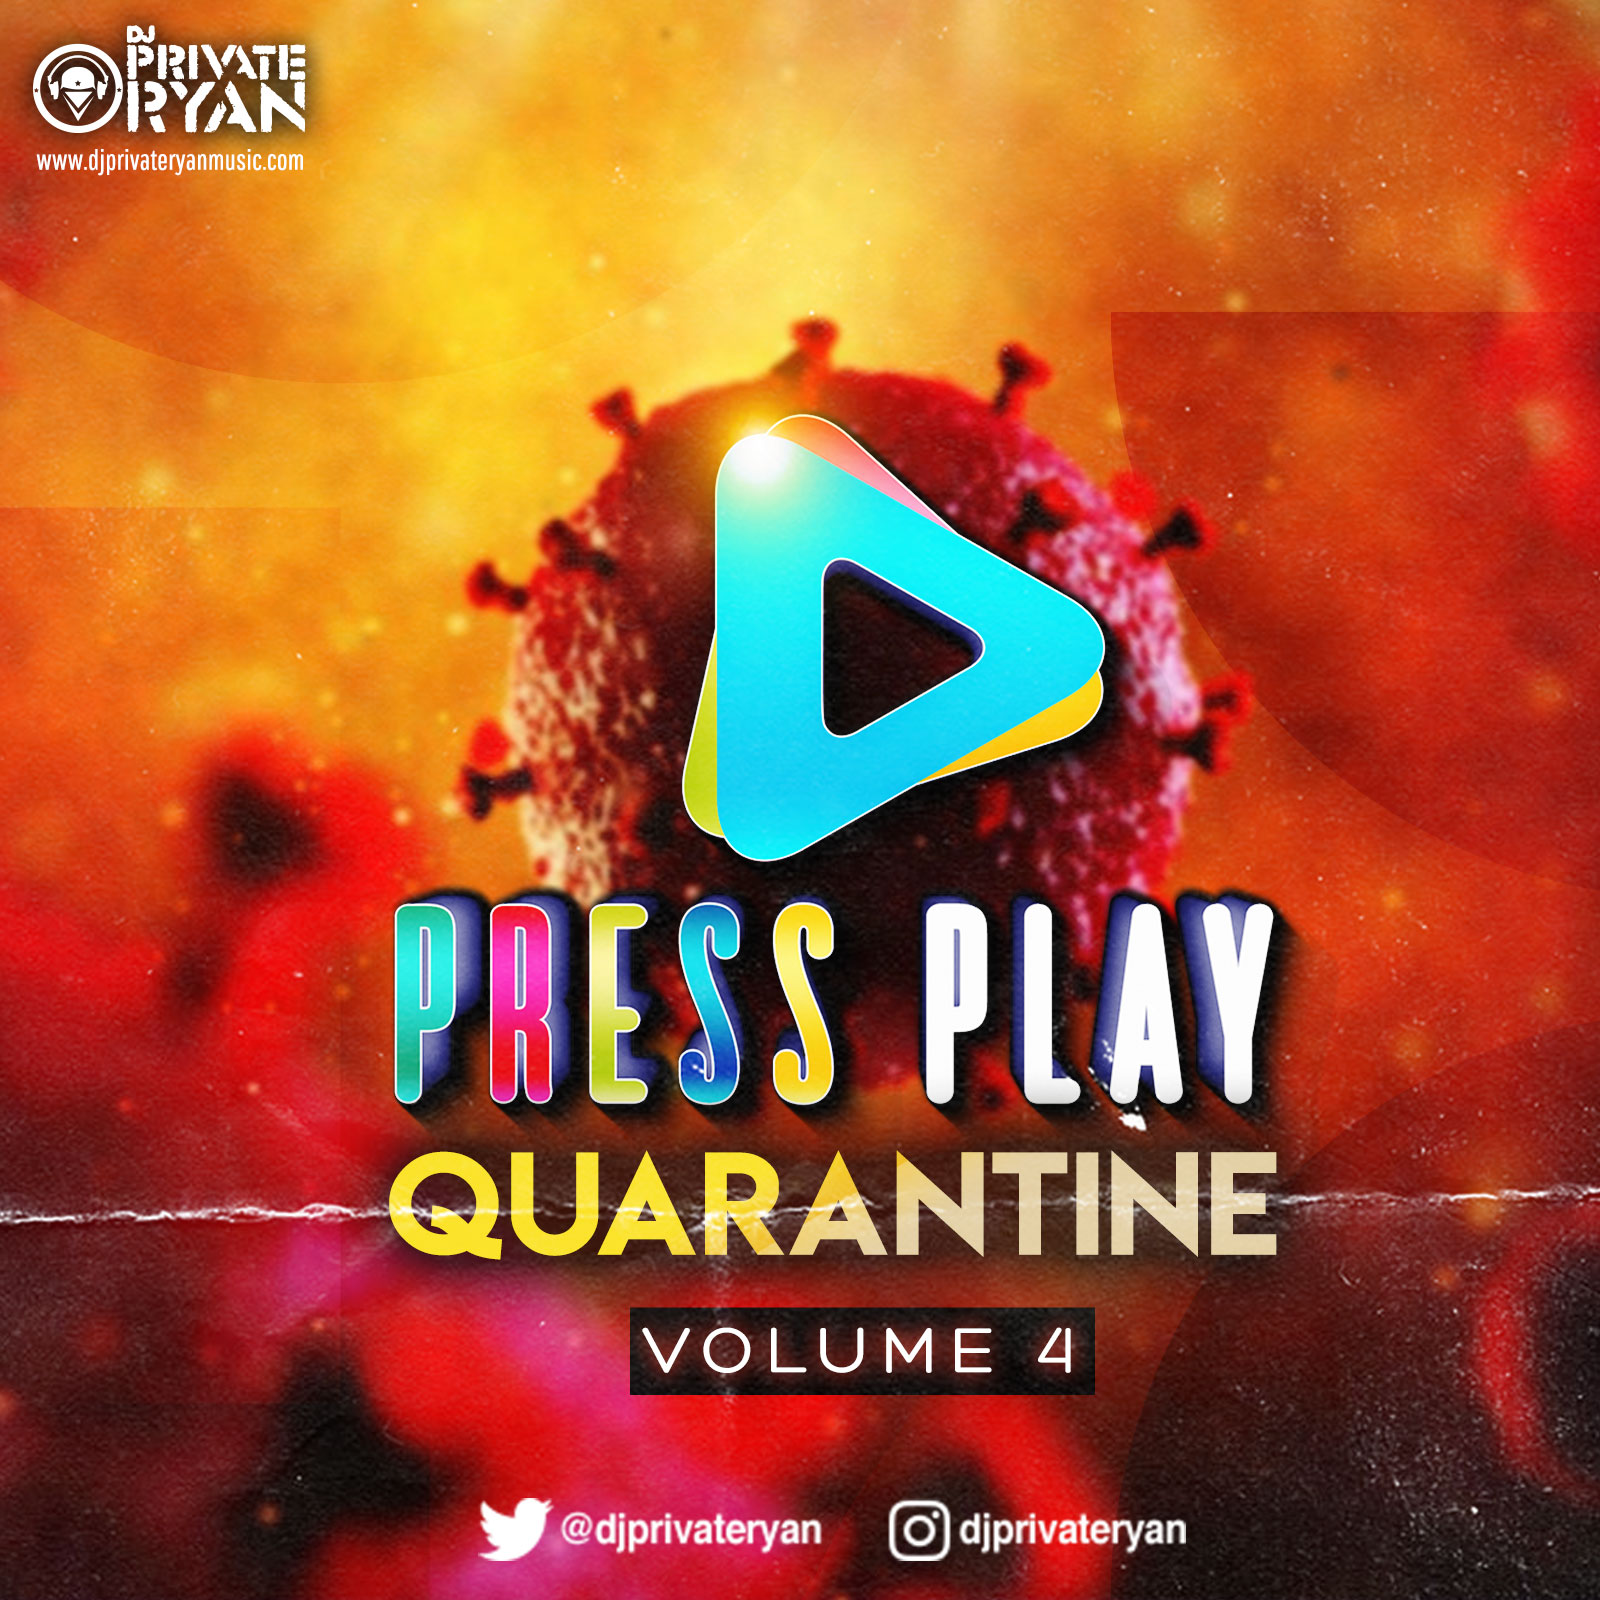 Private Ryan Presents Press Play Quarantine Volume 4 Mellow Edition (clean)